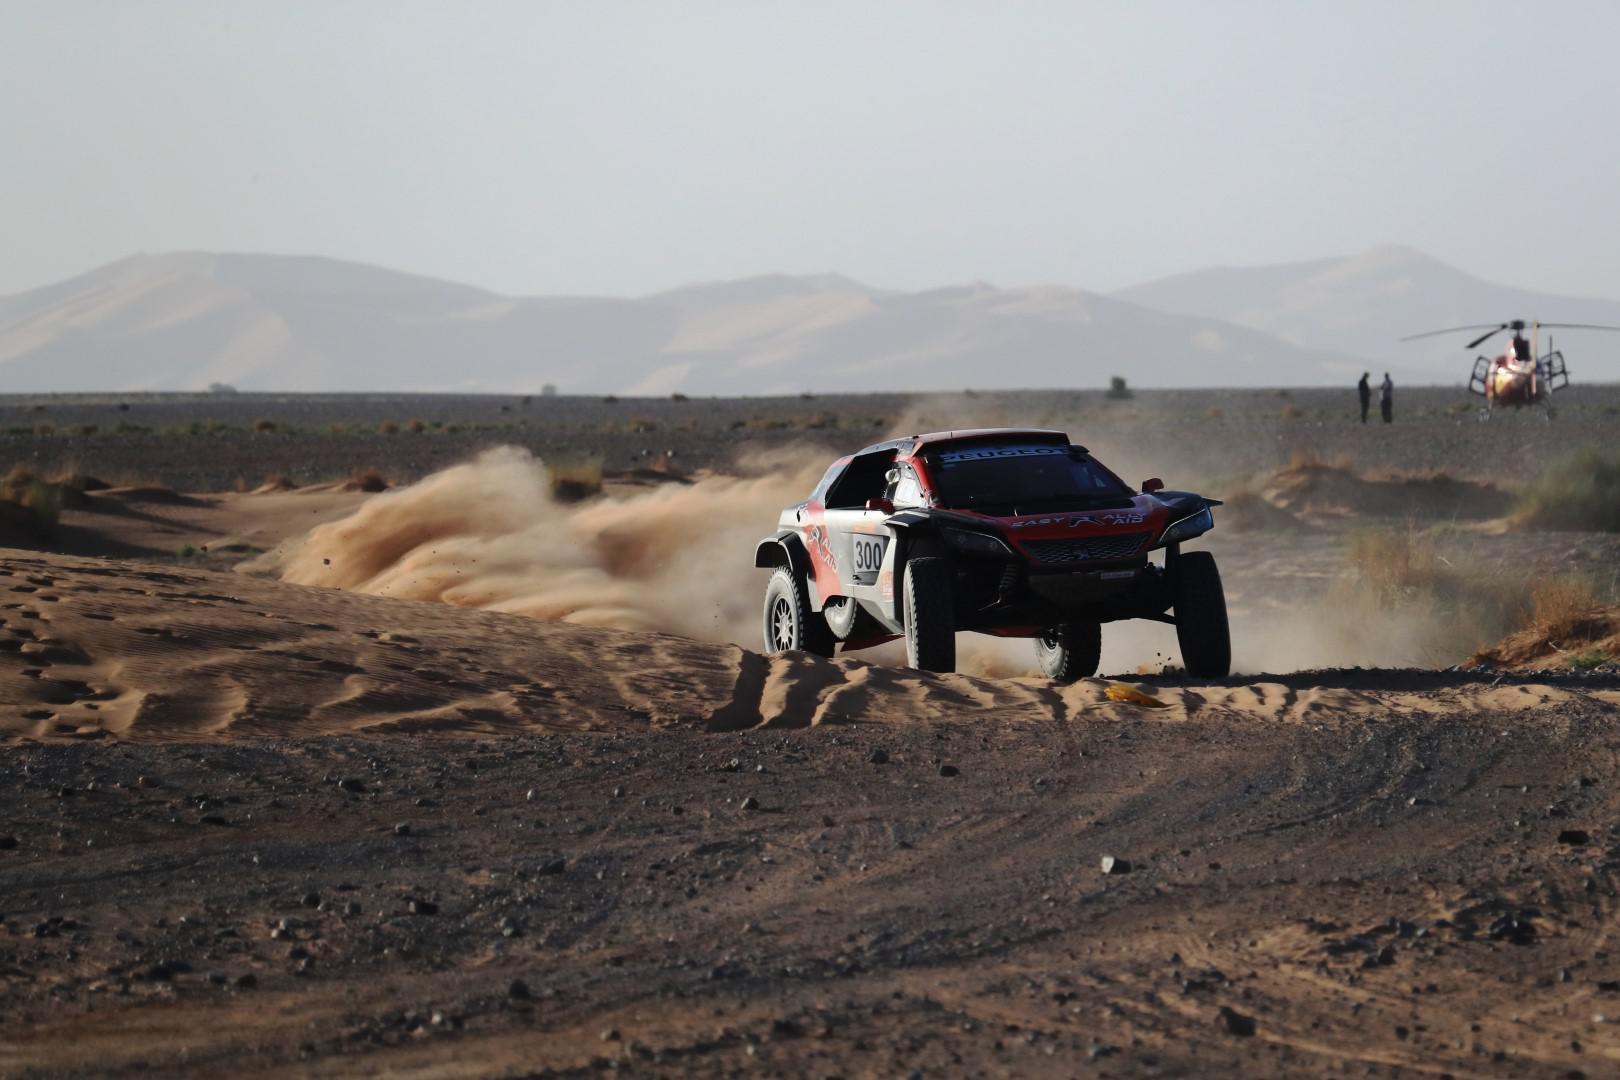 dakar-2019-jean-pascal-besson-affronte-le-desert-du-perou-922-3.jpg